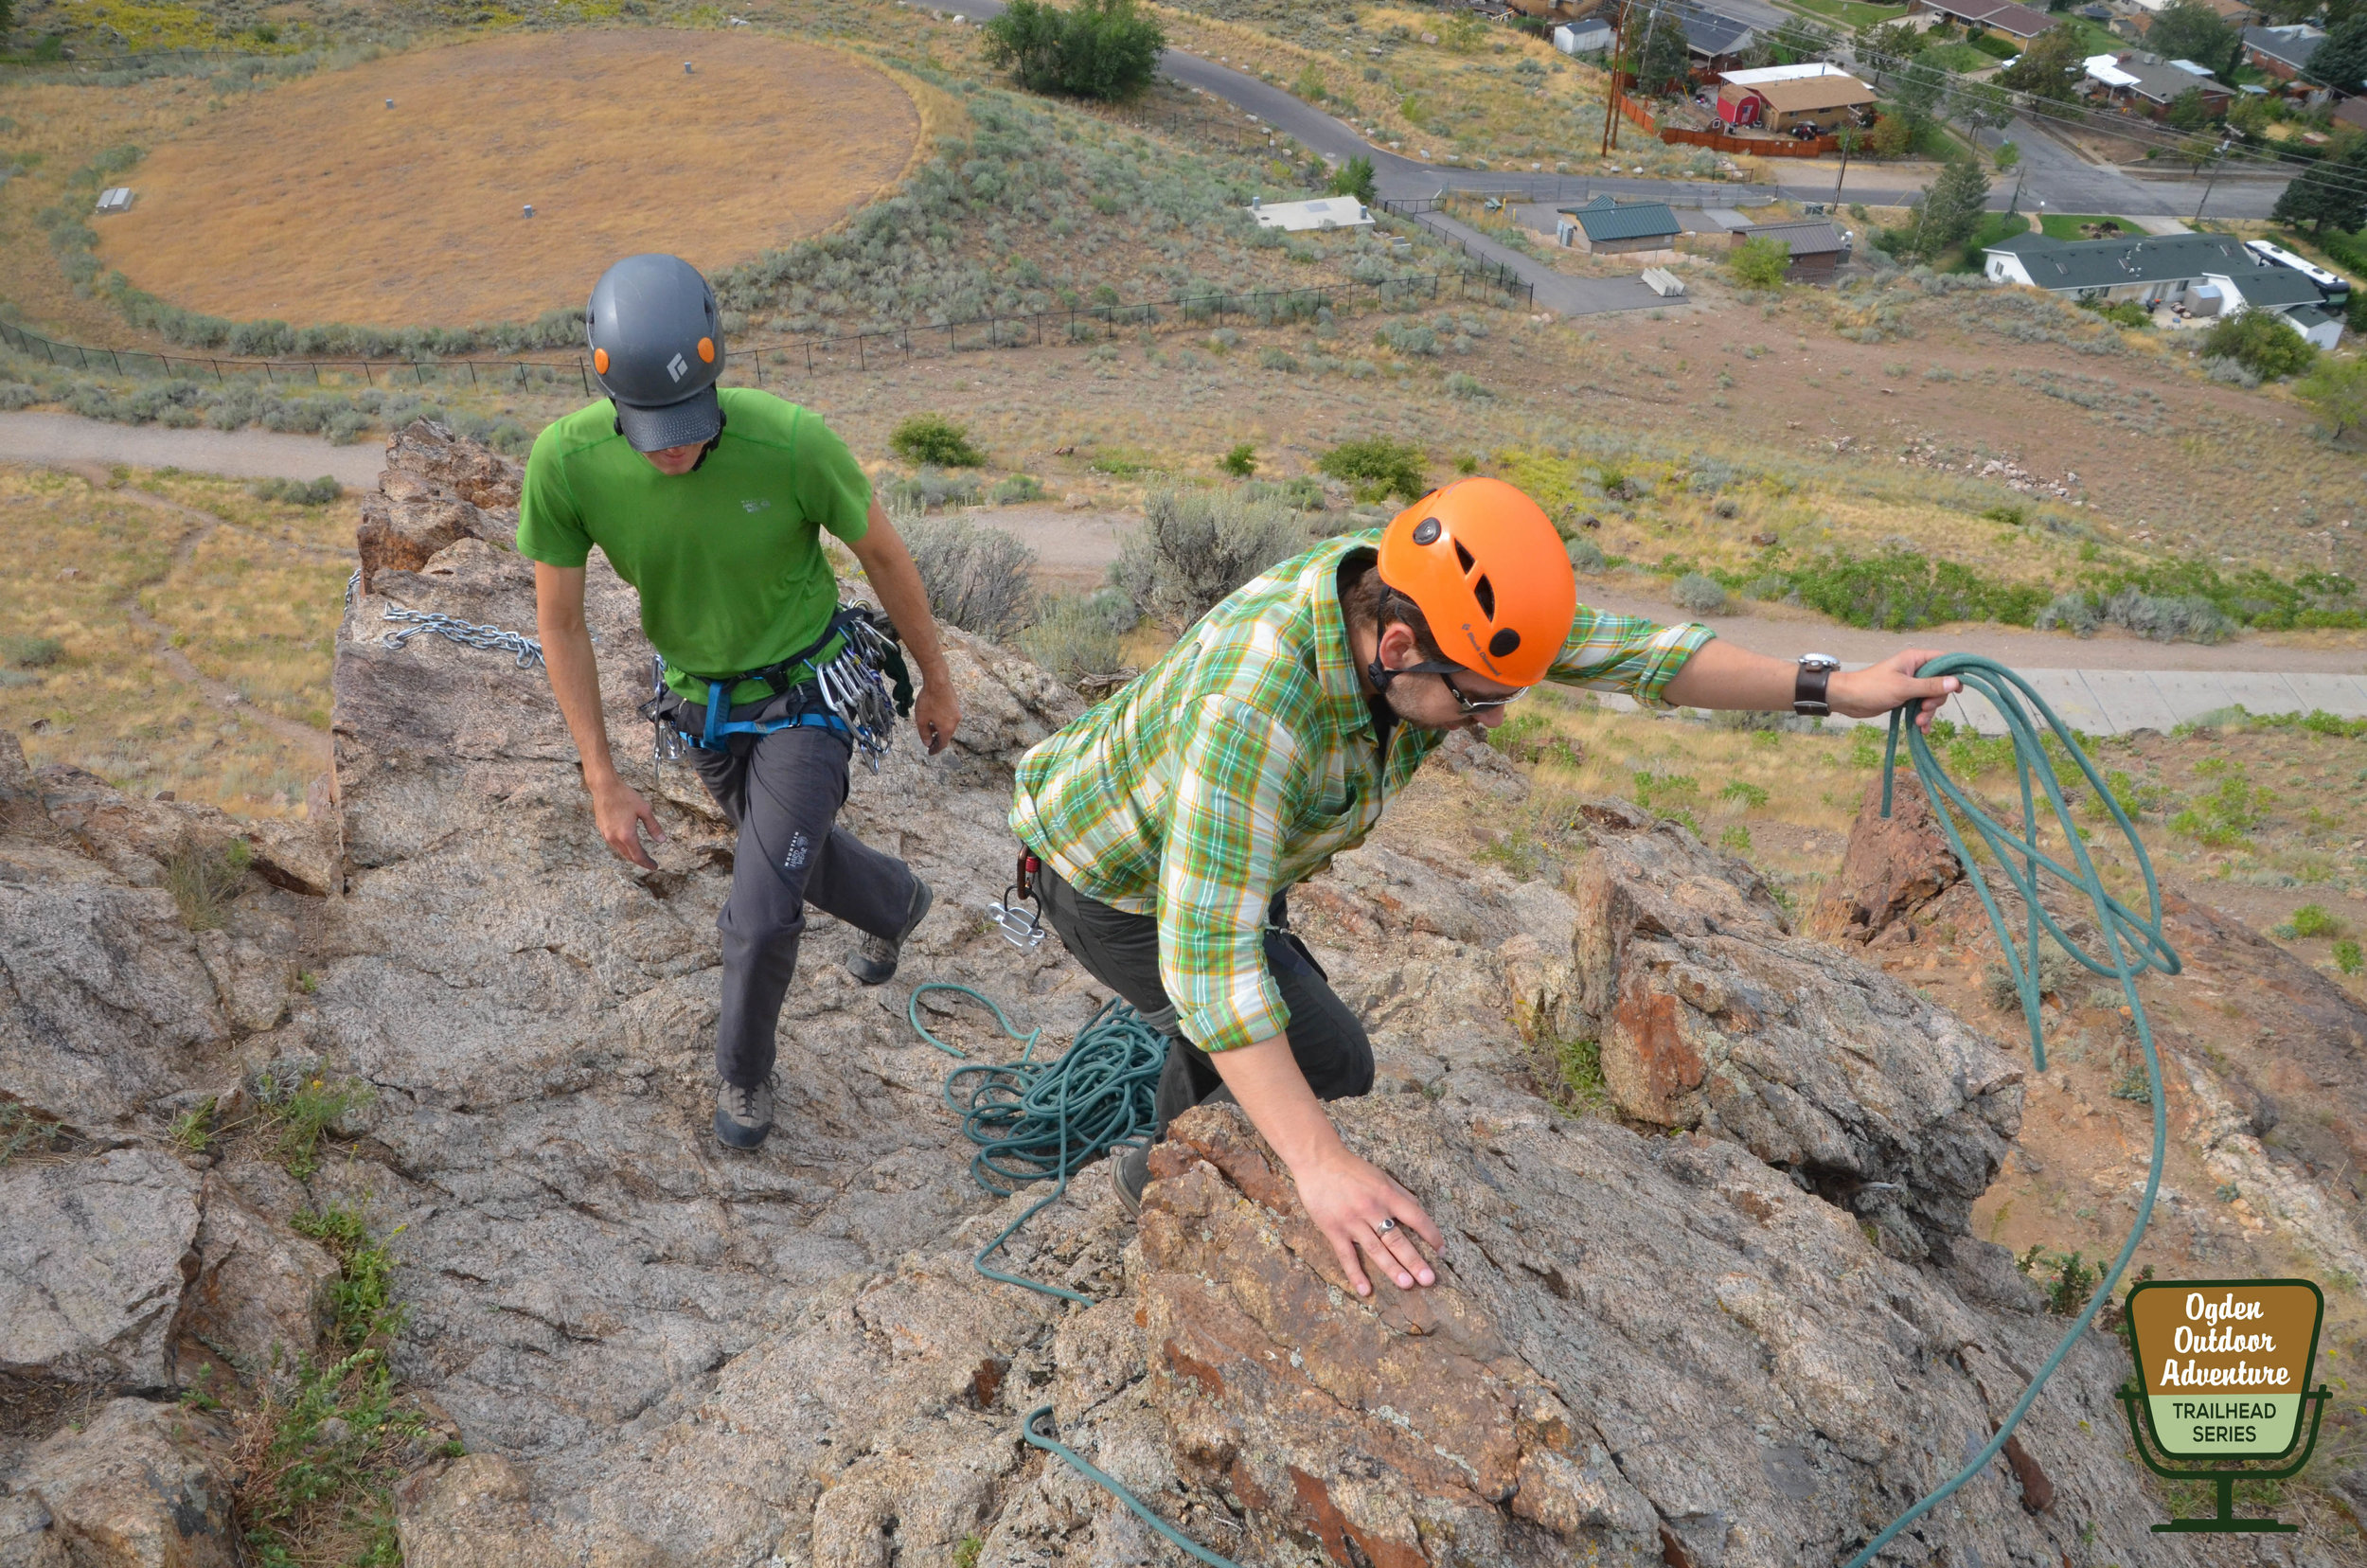 Ogden Outdoor Adventure Show 248 - Bear House Mountaineering-6.jpg